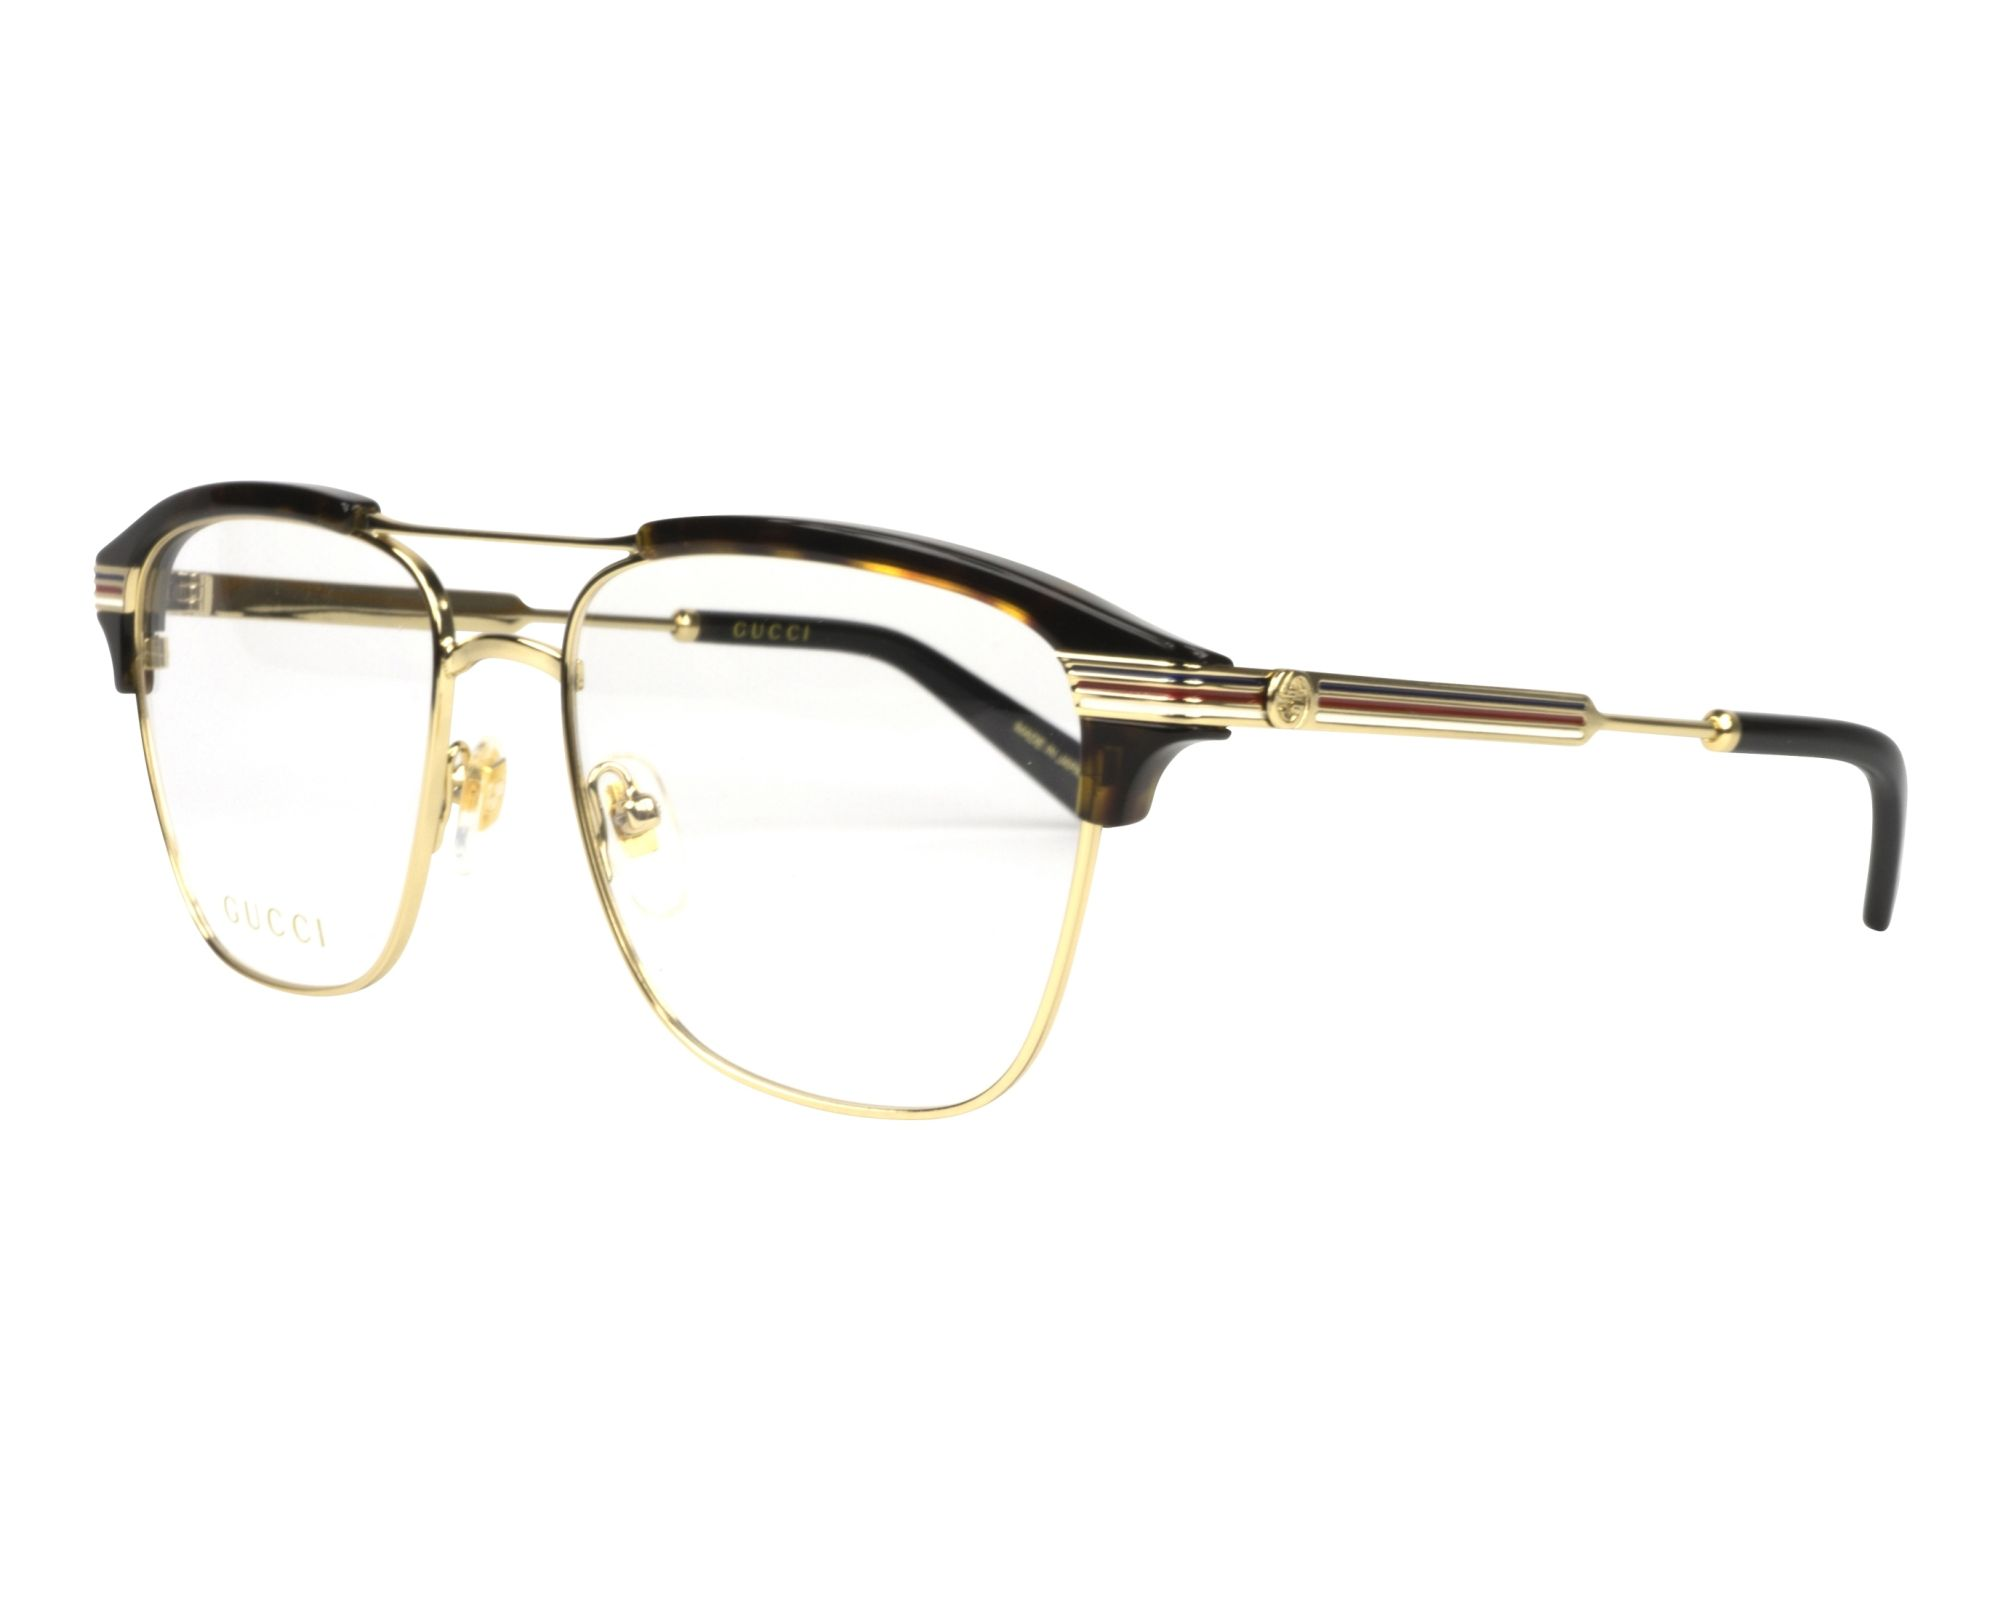 73aab46e60dd eyeglasses Gucci GG-0241-O 003 54-17 Gold Havana profile view